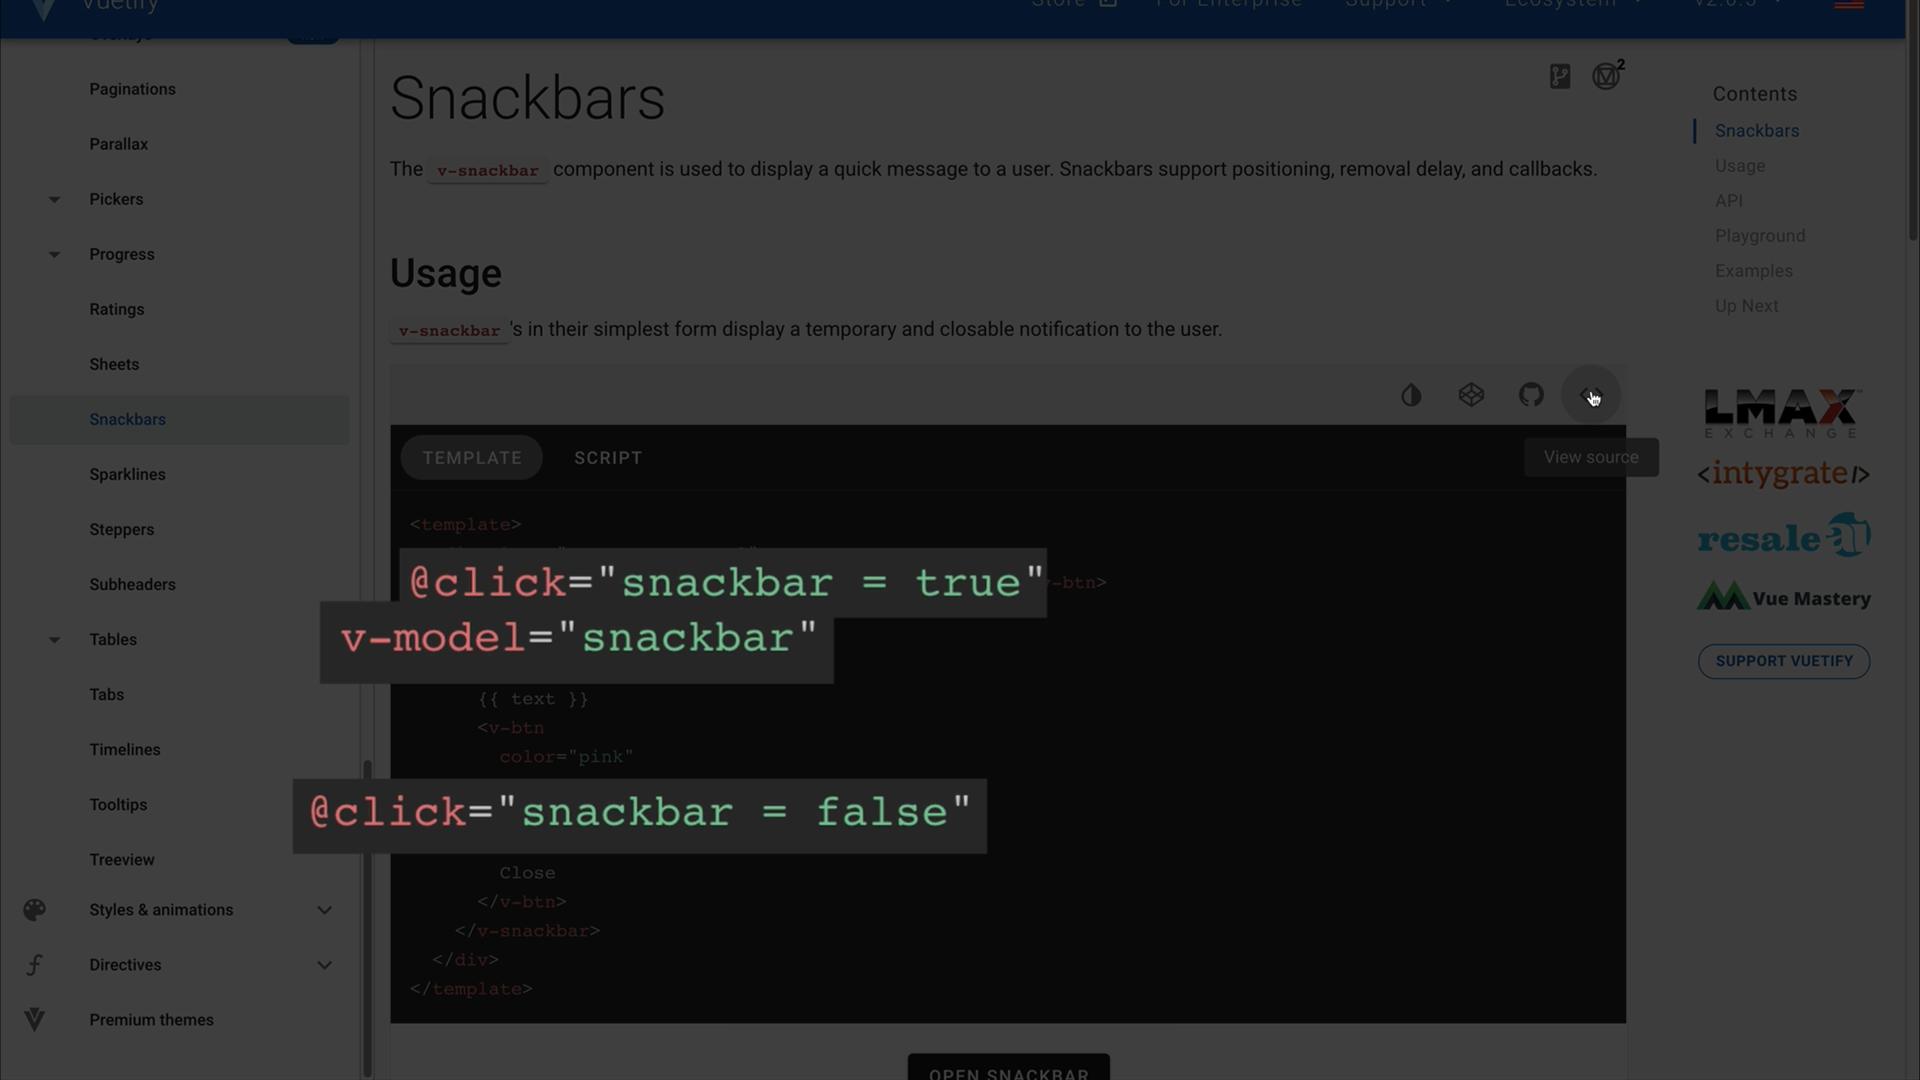 Screenshot of Snackbar source code